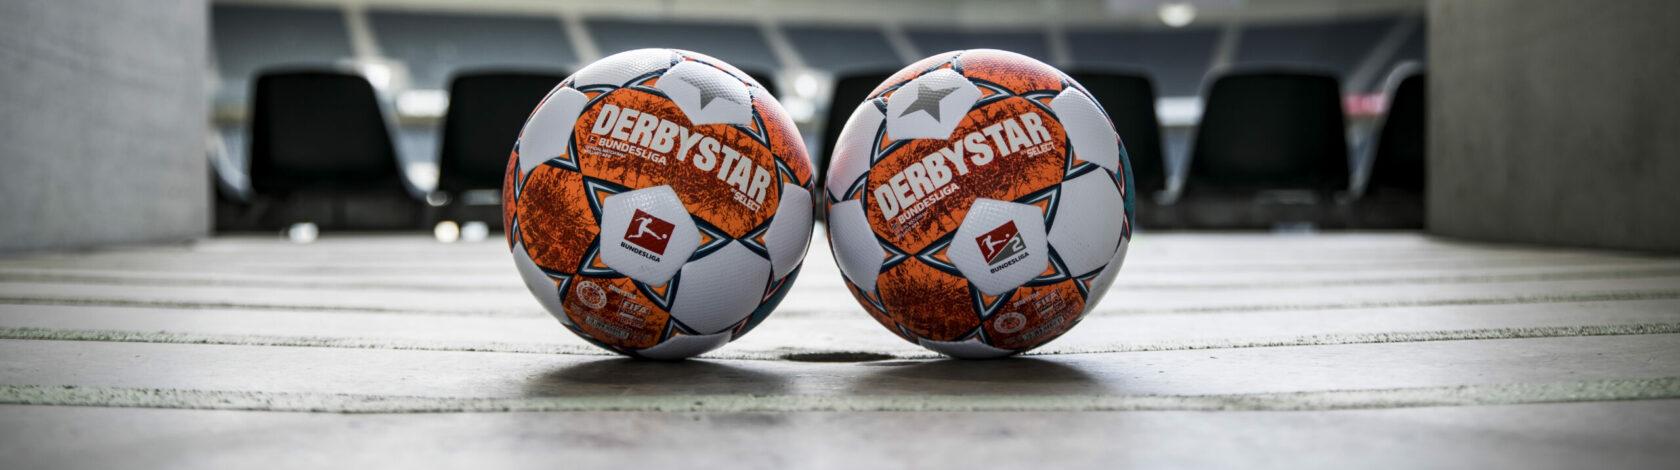 DFL_DERBYSTAR_Bundesliga_Brillant_Aps_21-22_2